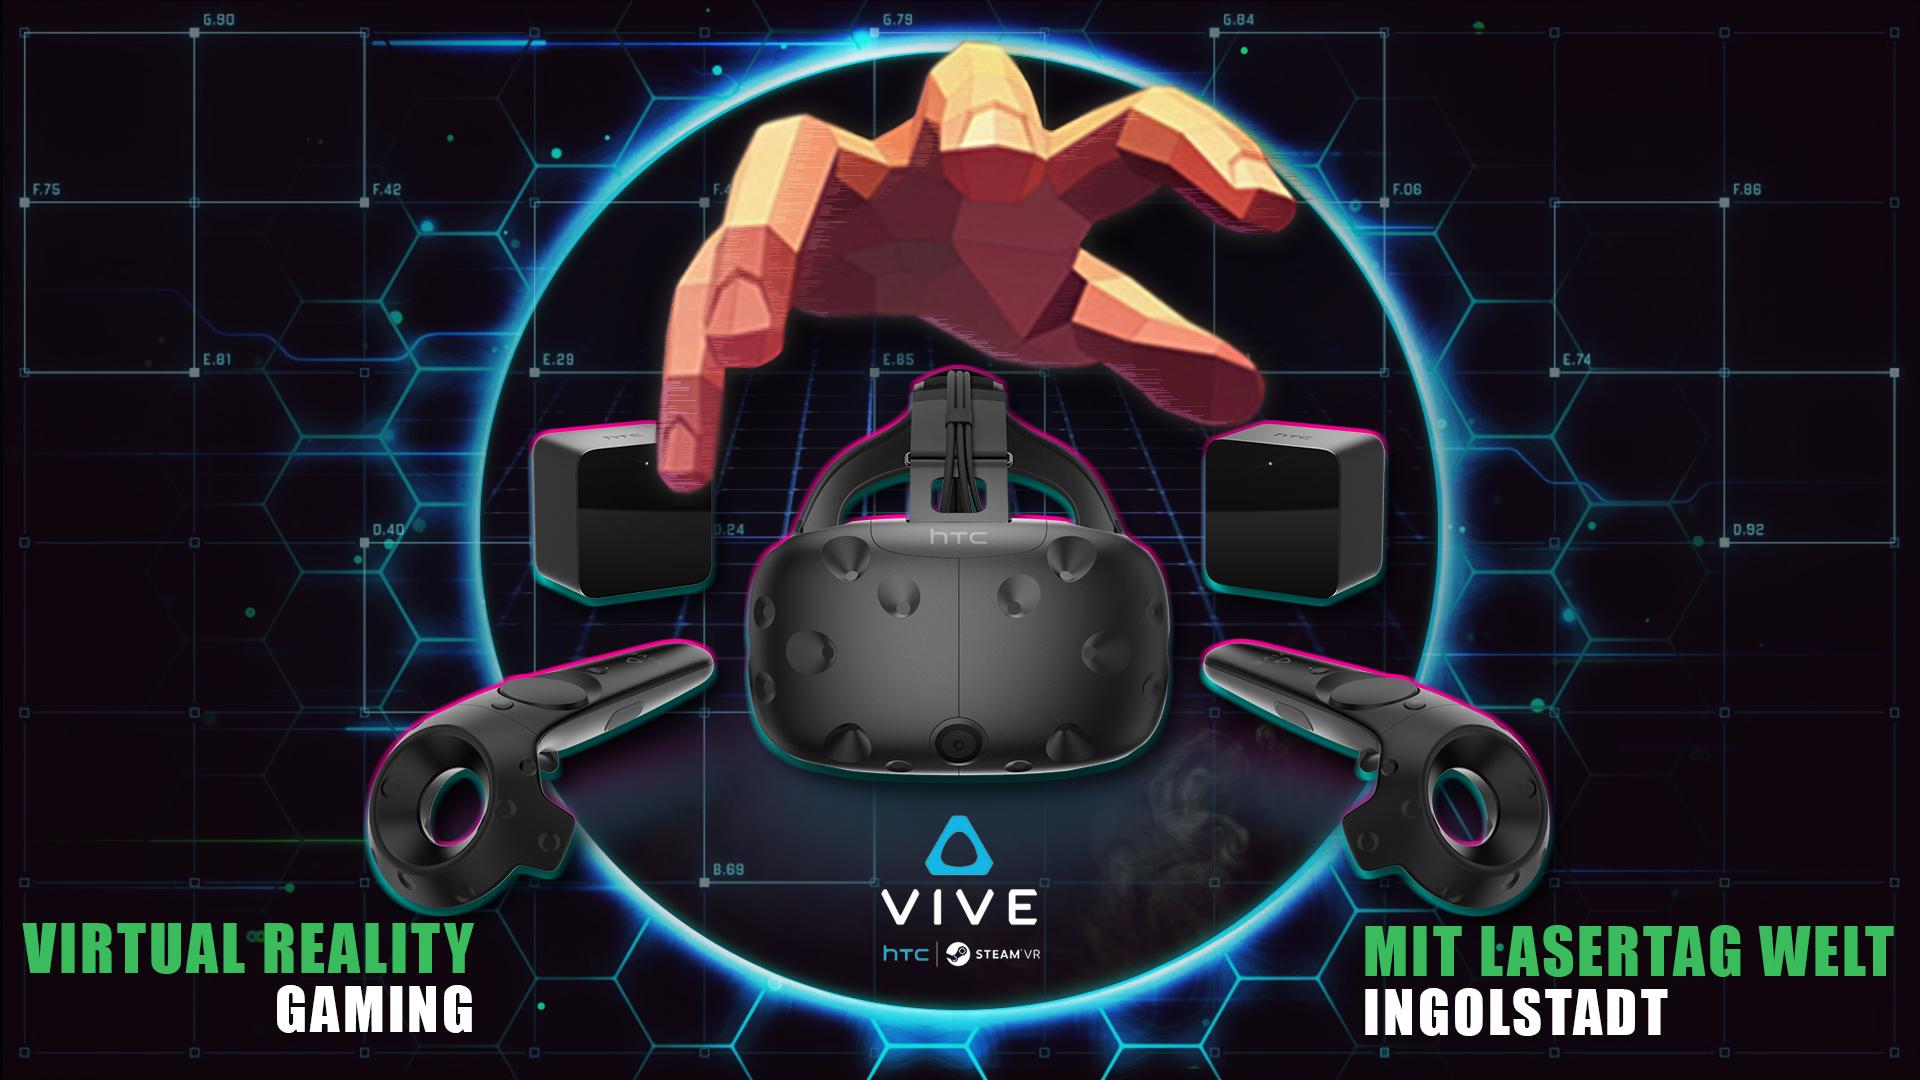 Virtual Reality Ingolstadt